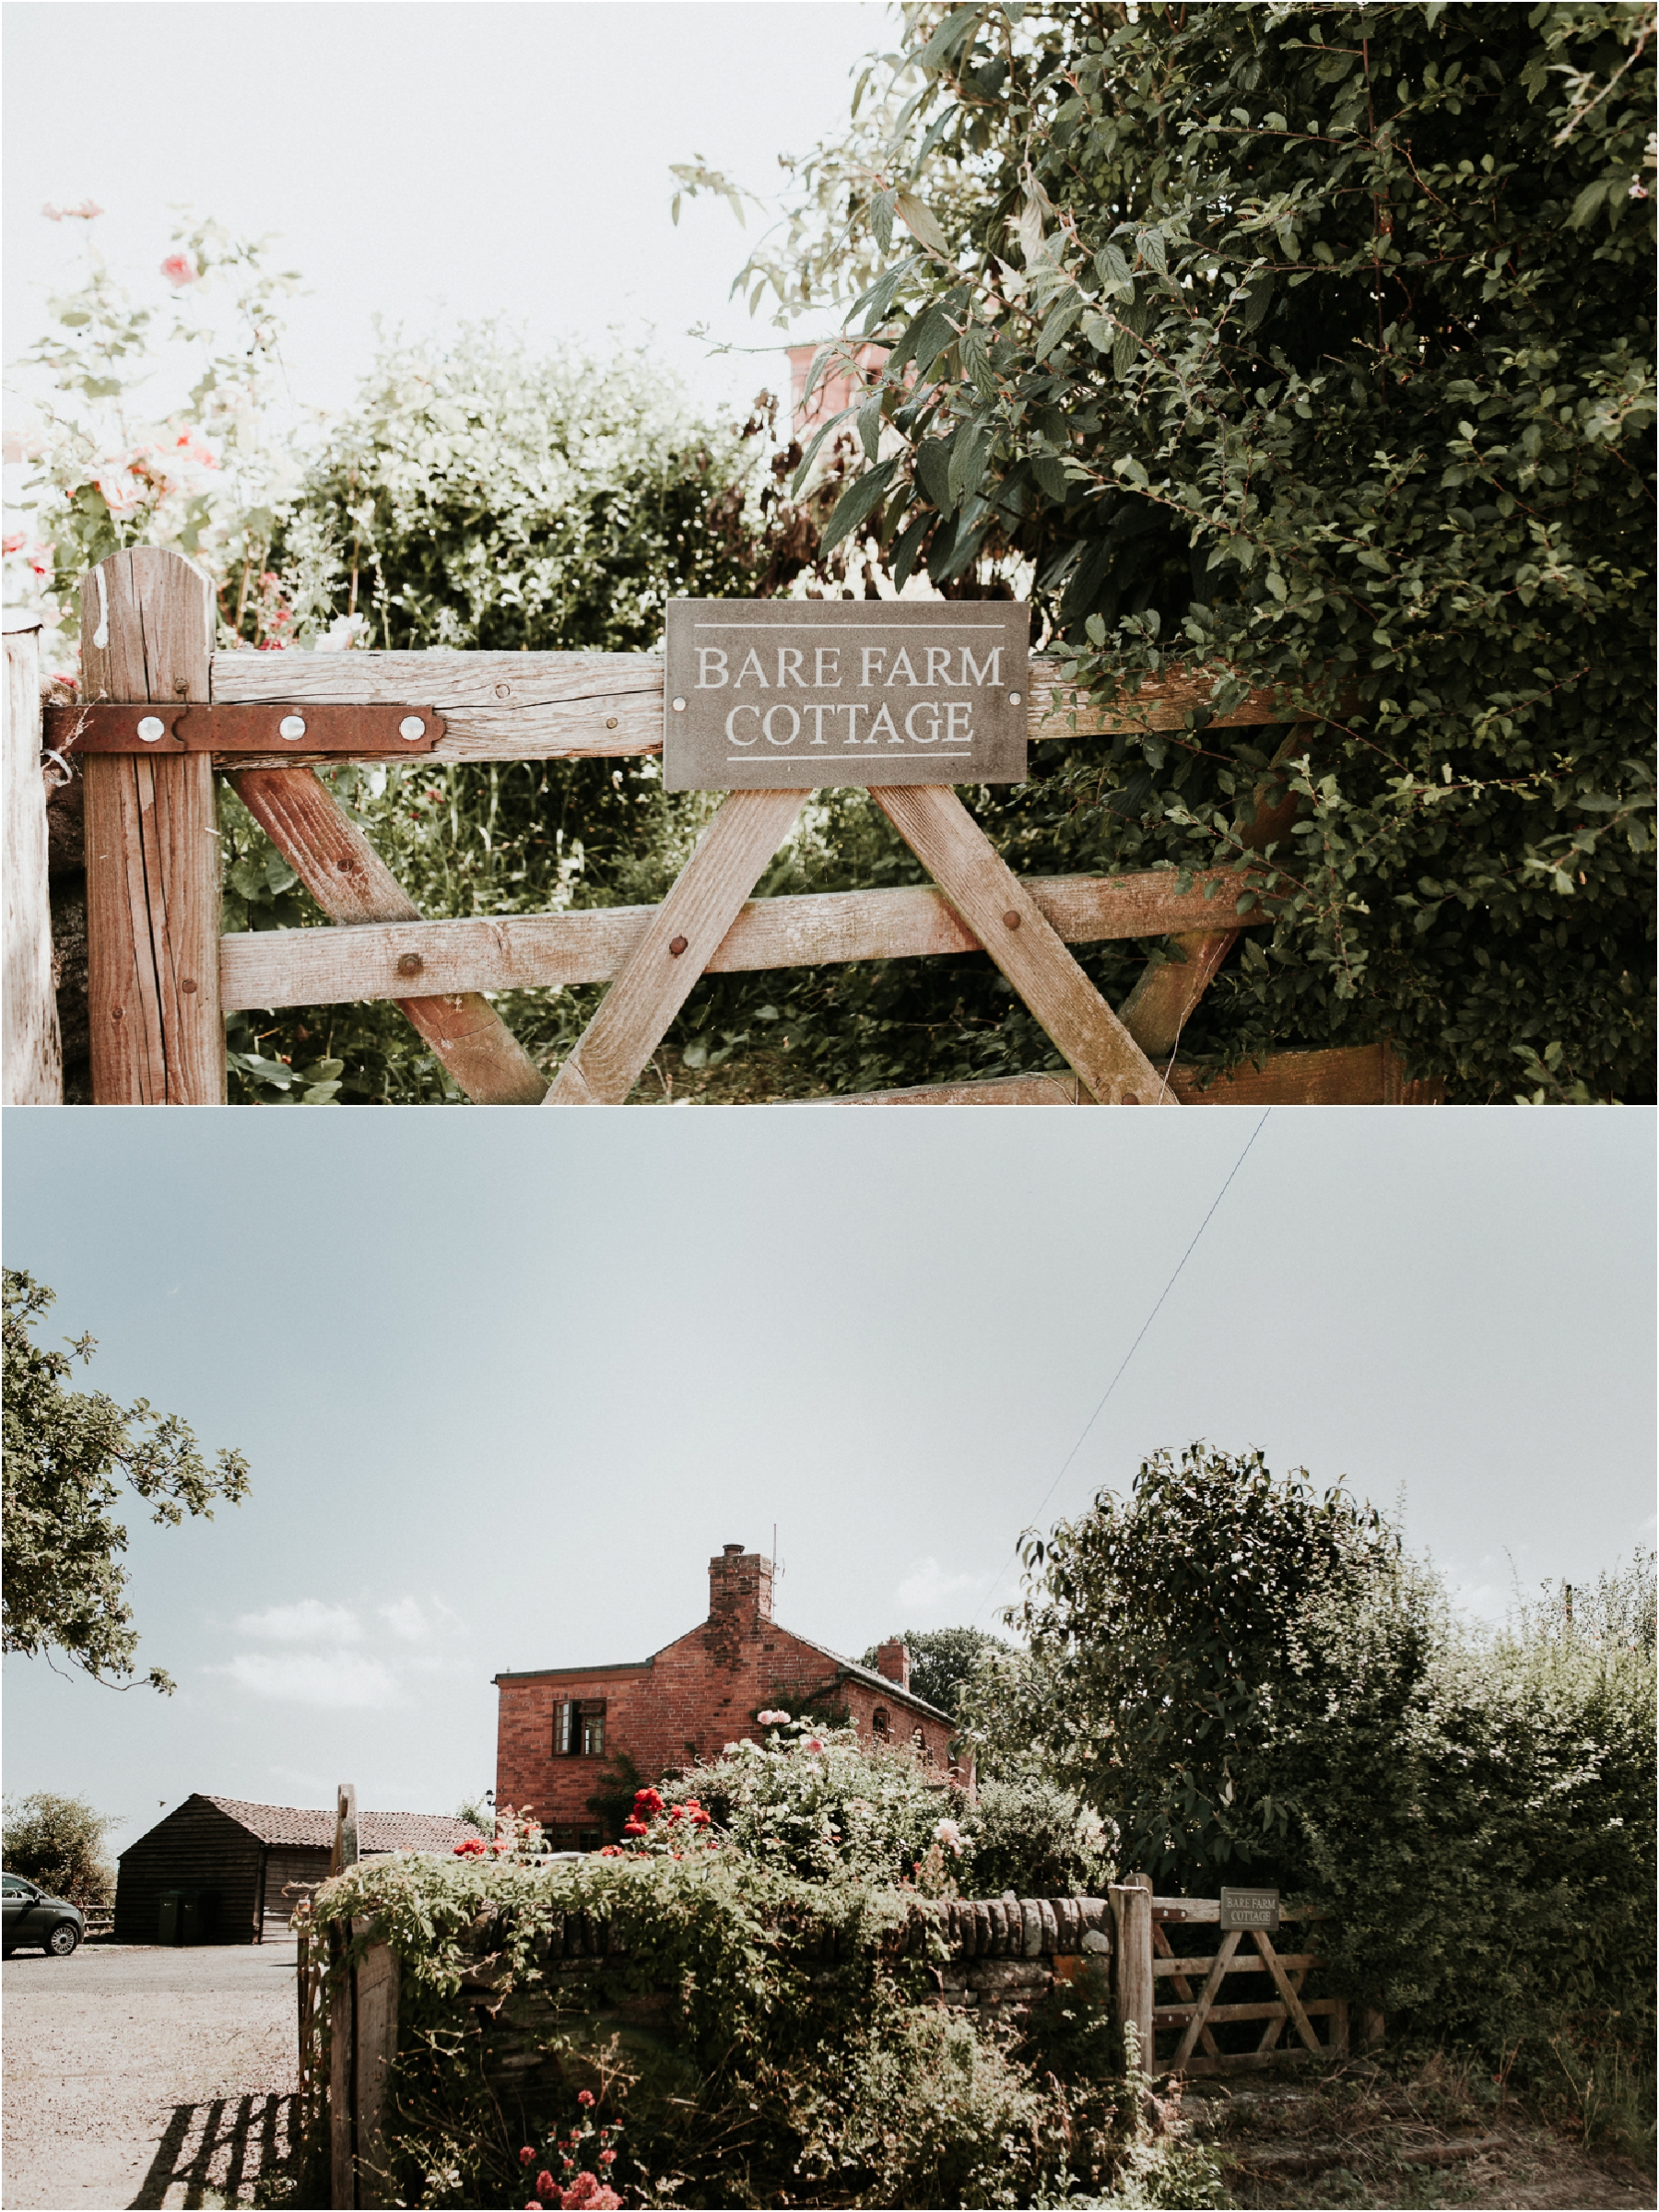 Herefordshire-uk-wedding-photographer_0006.jpg